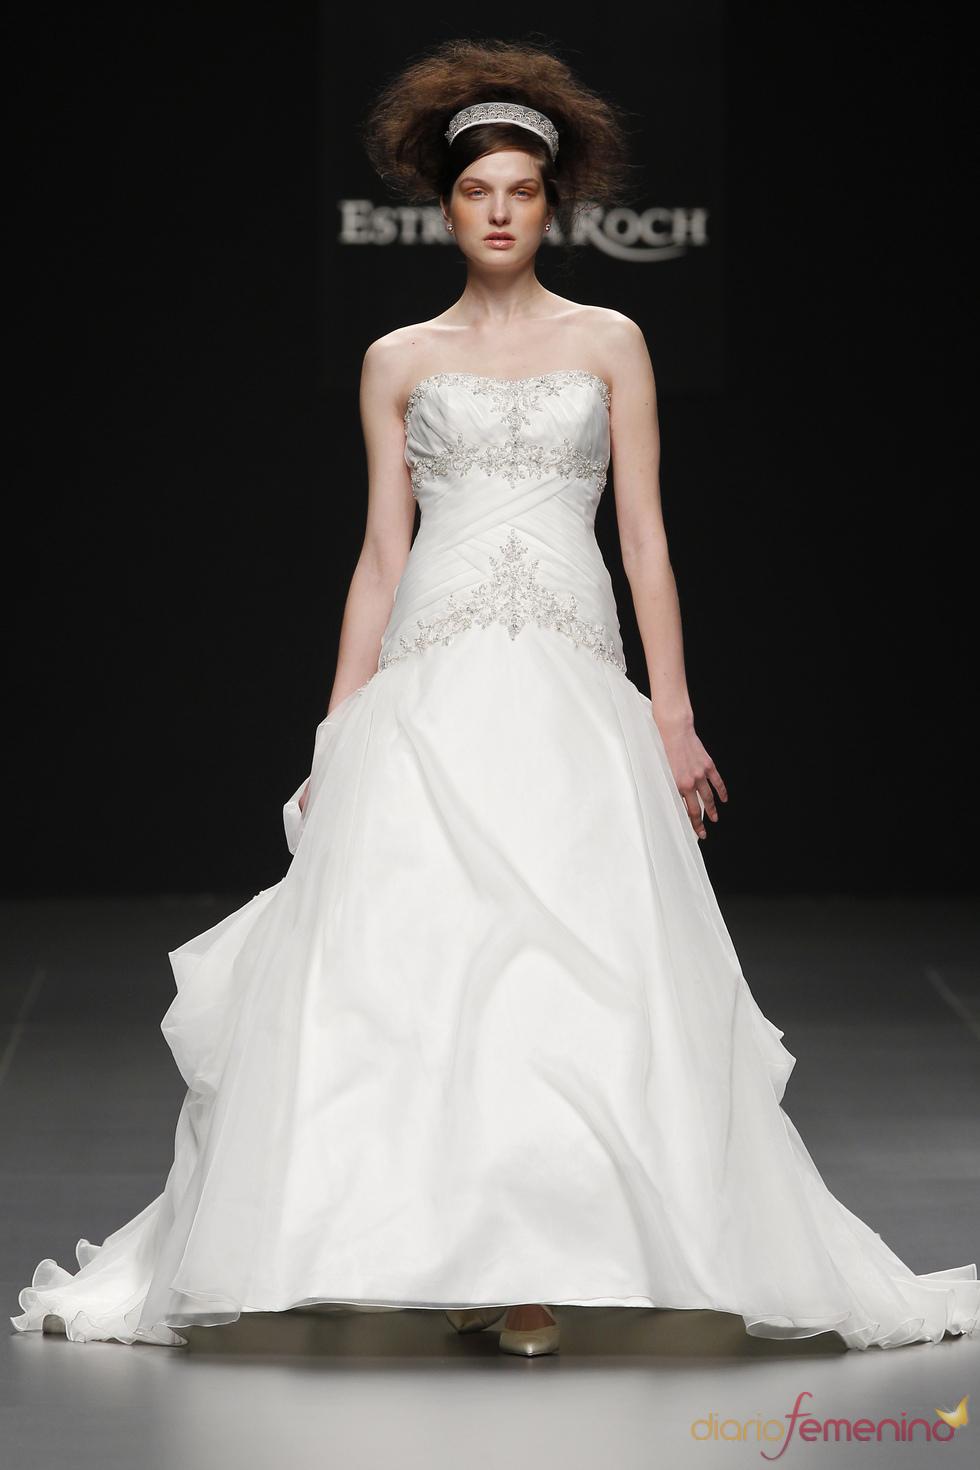 Vestido de novia con pedrería de Camila Elbaz